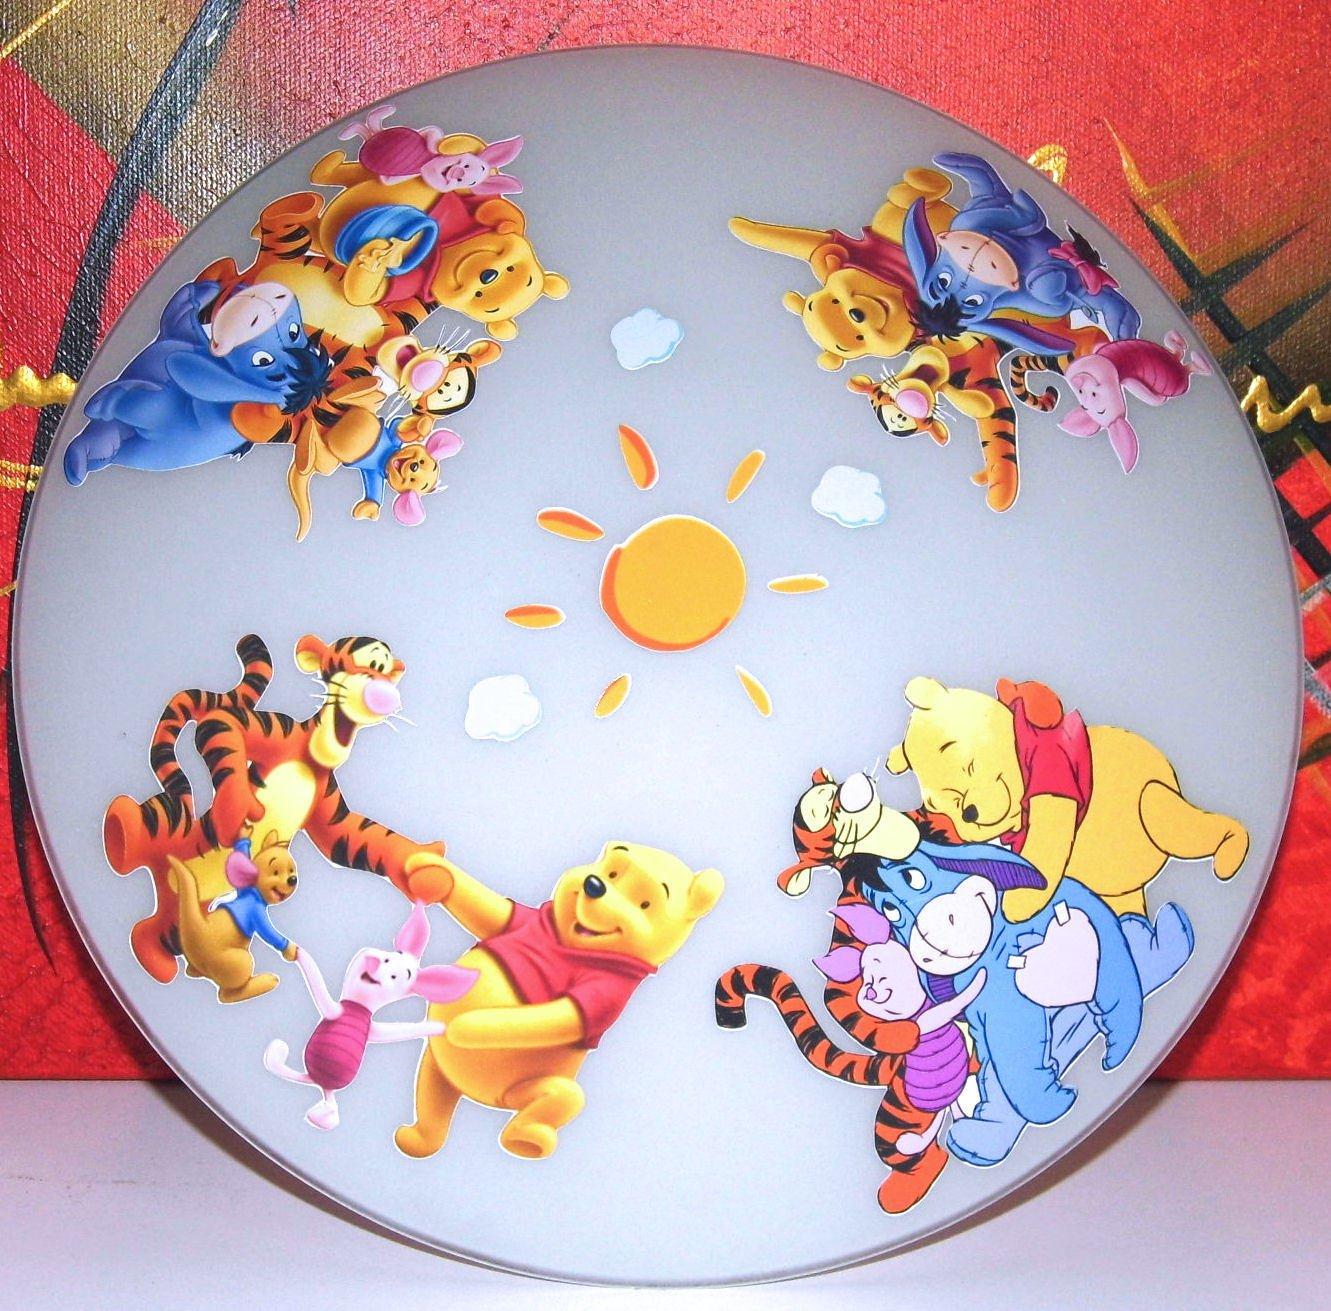 LED Deckenlampe Winnie Pooh Wandlampe Kinderzimmerlampe D3 TV-24